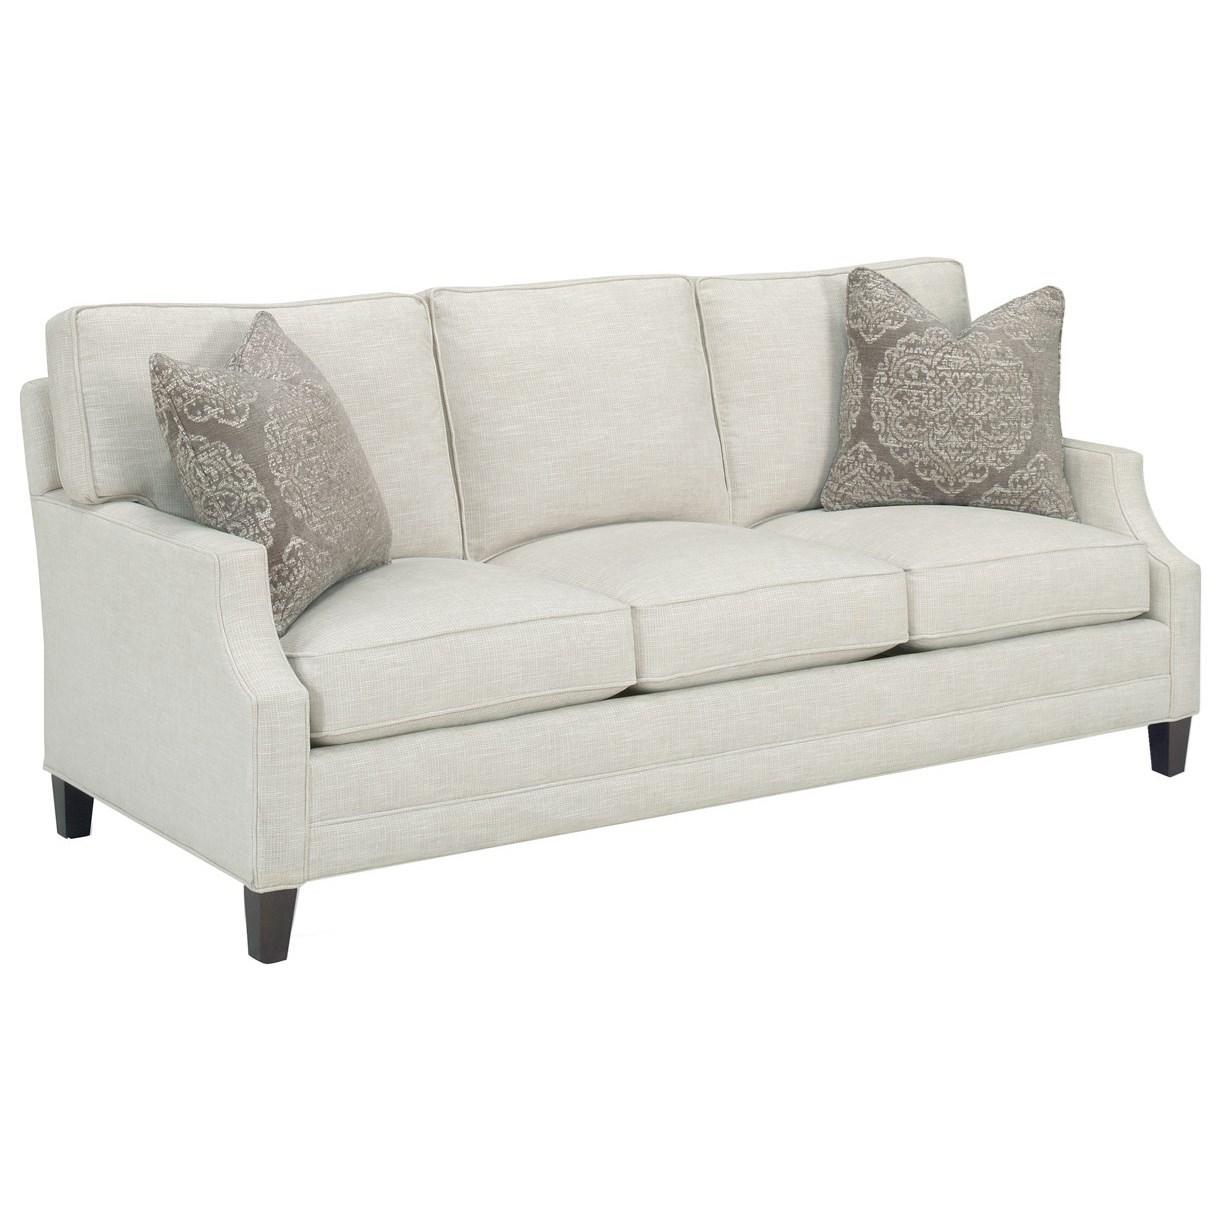 Lexington Personal Design Series 6300 33 Bristol Customizable Sofa Scoop Arm Boxed Edge Back